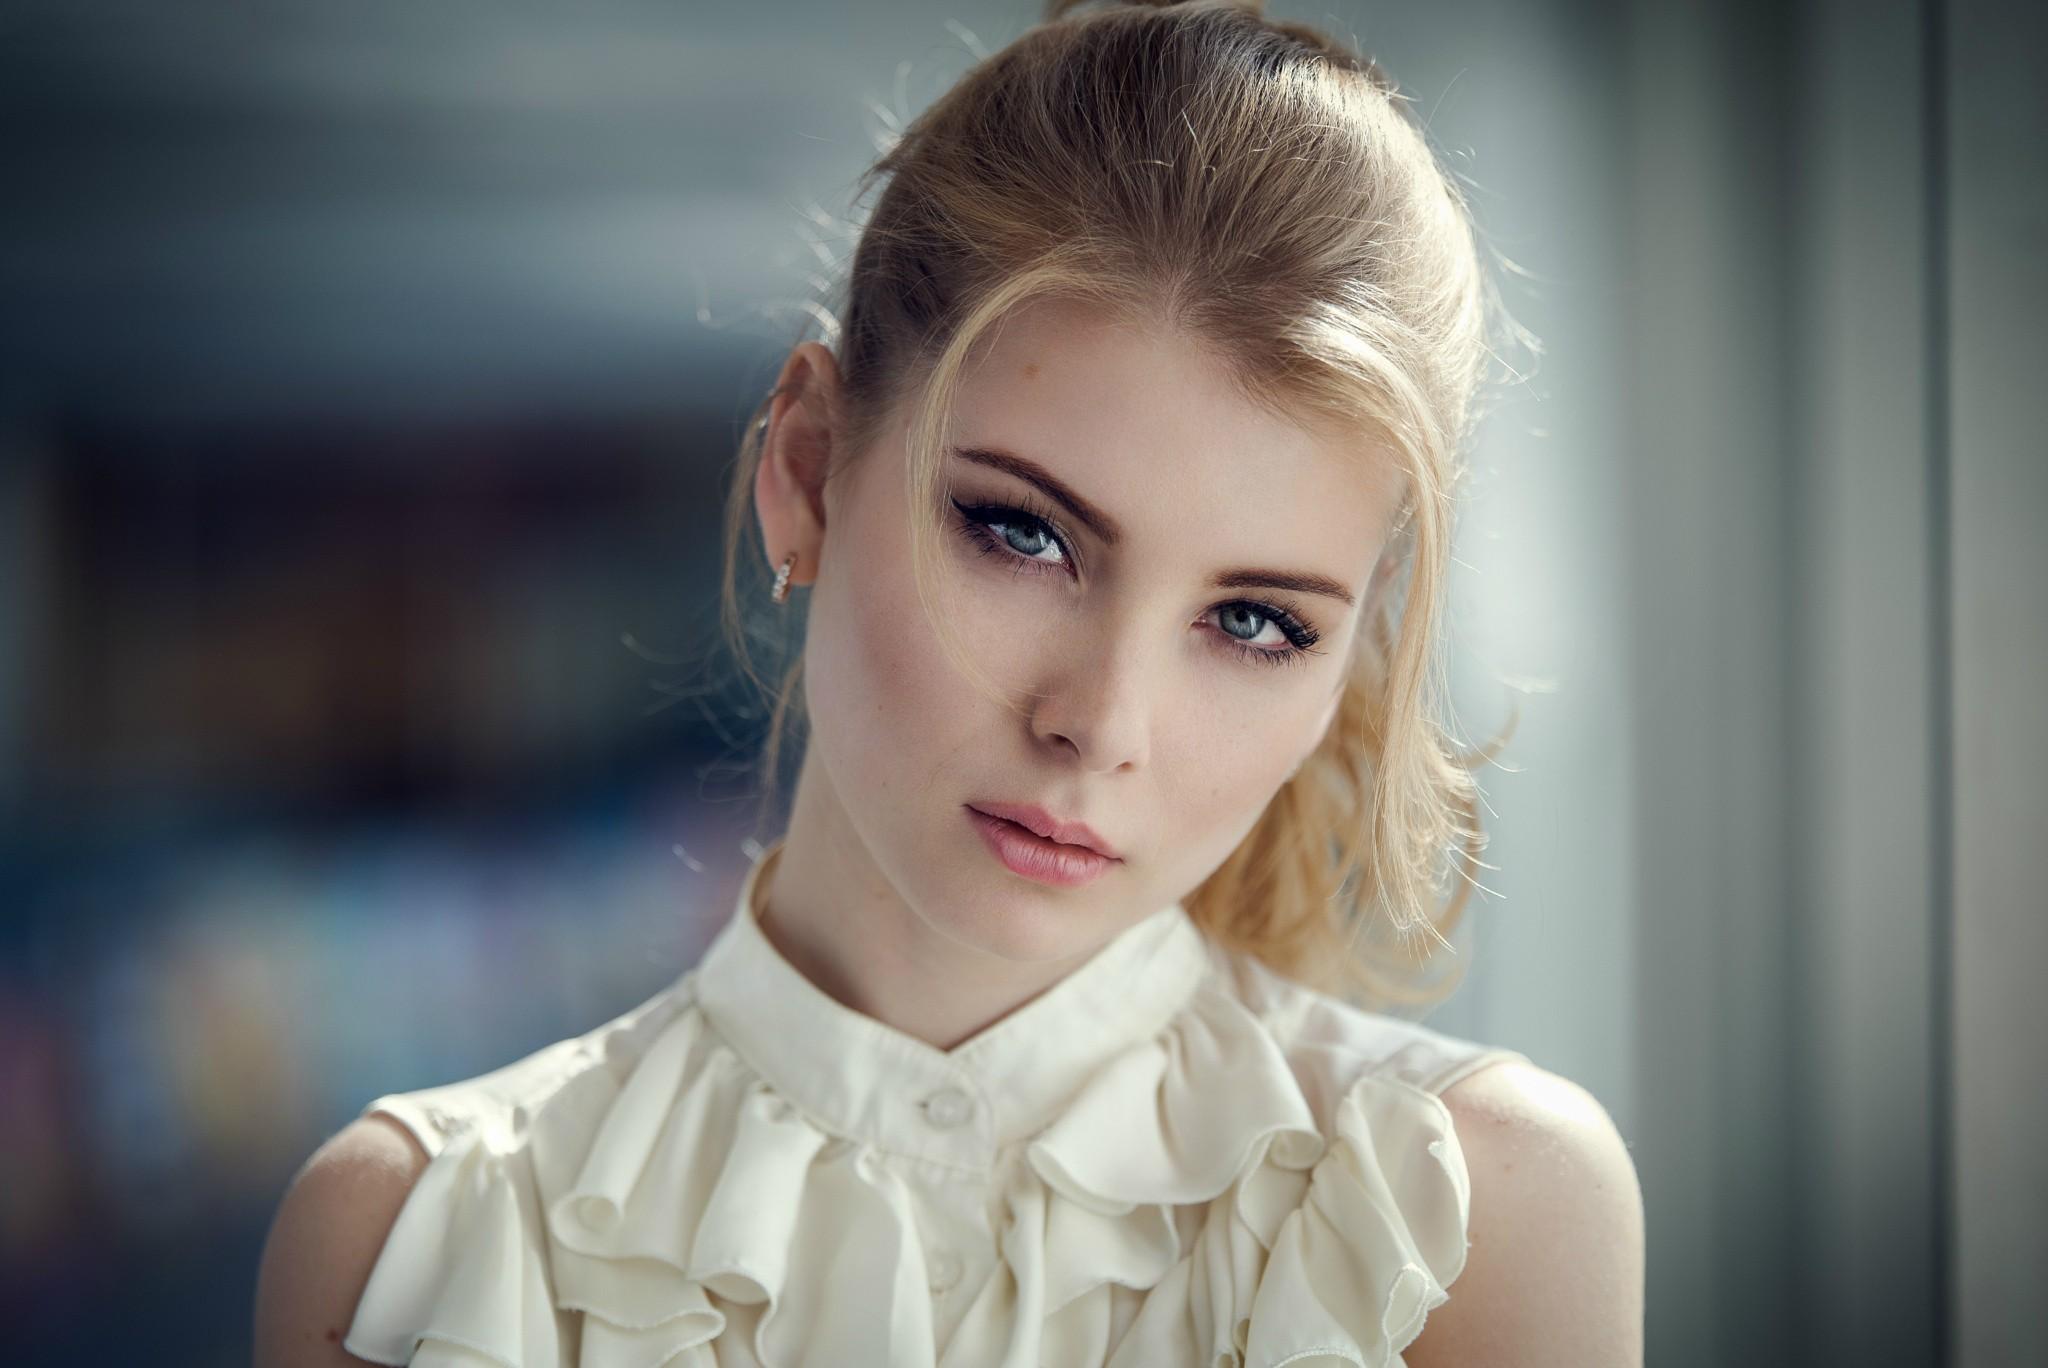 Cute Child Love Wallpaper Irina Popova Close Up Hd Girls 4k Wallpapers Images